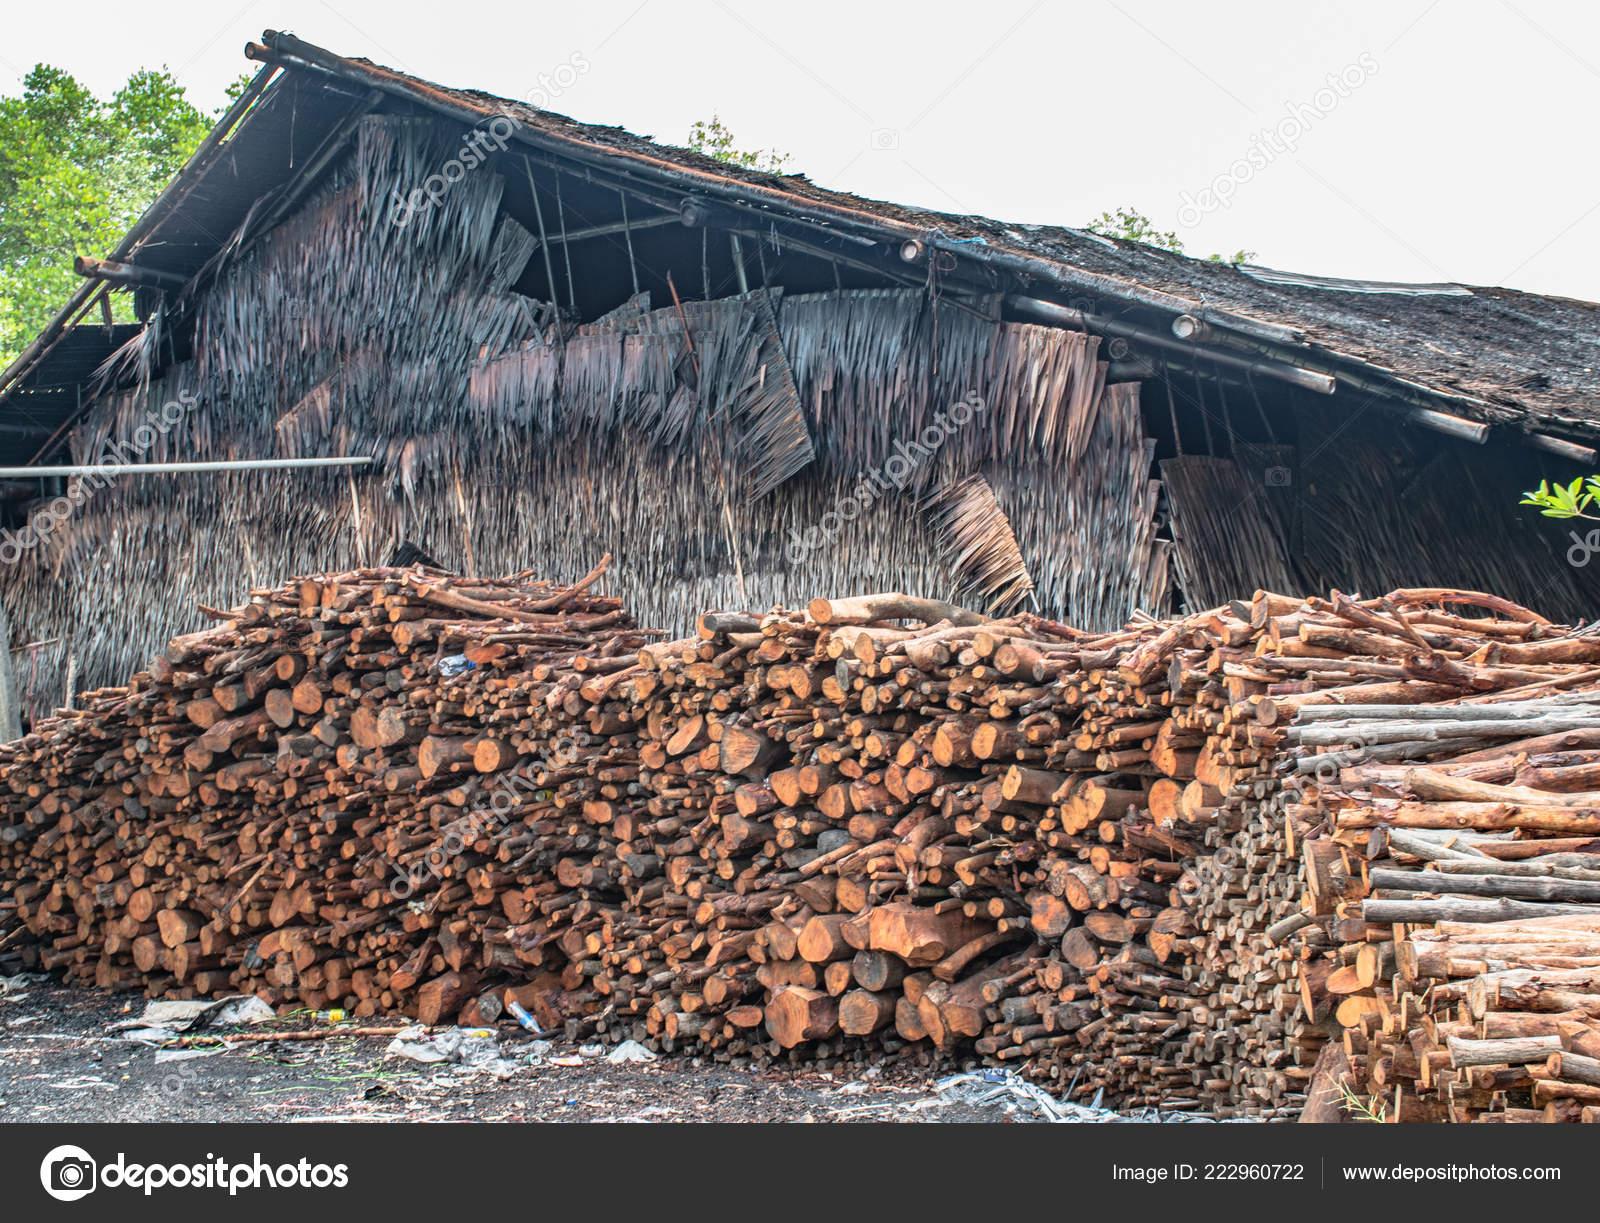 Mangrove Wood Raw Material Charcoal — Stock Photo © upinyo54 hotmail